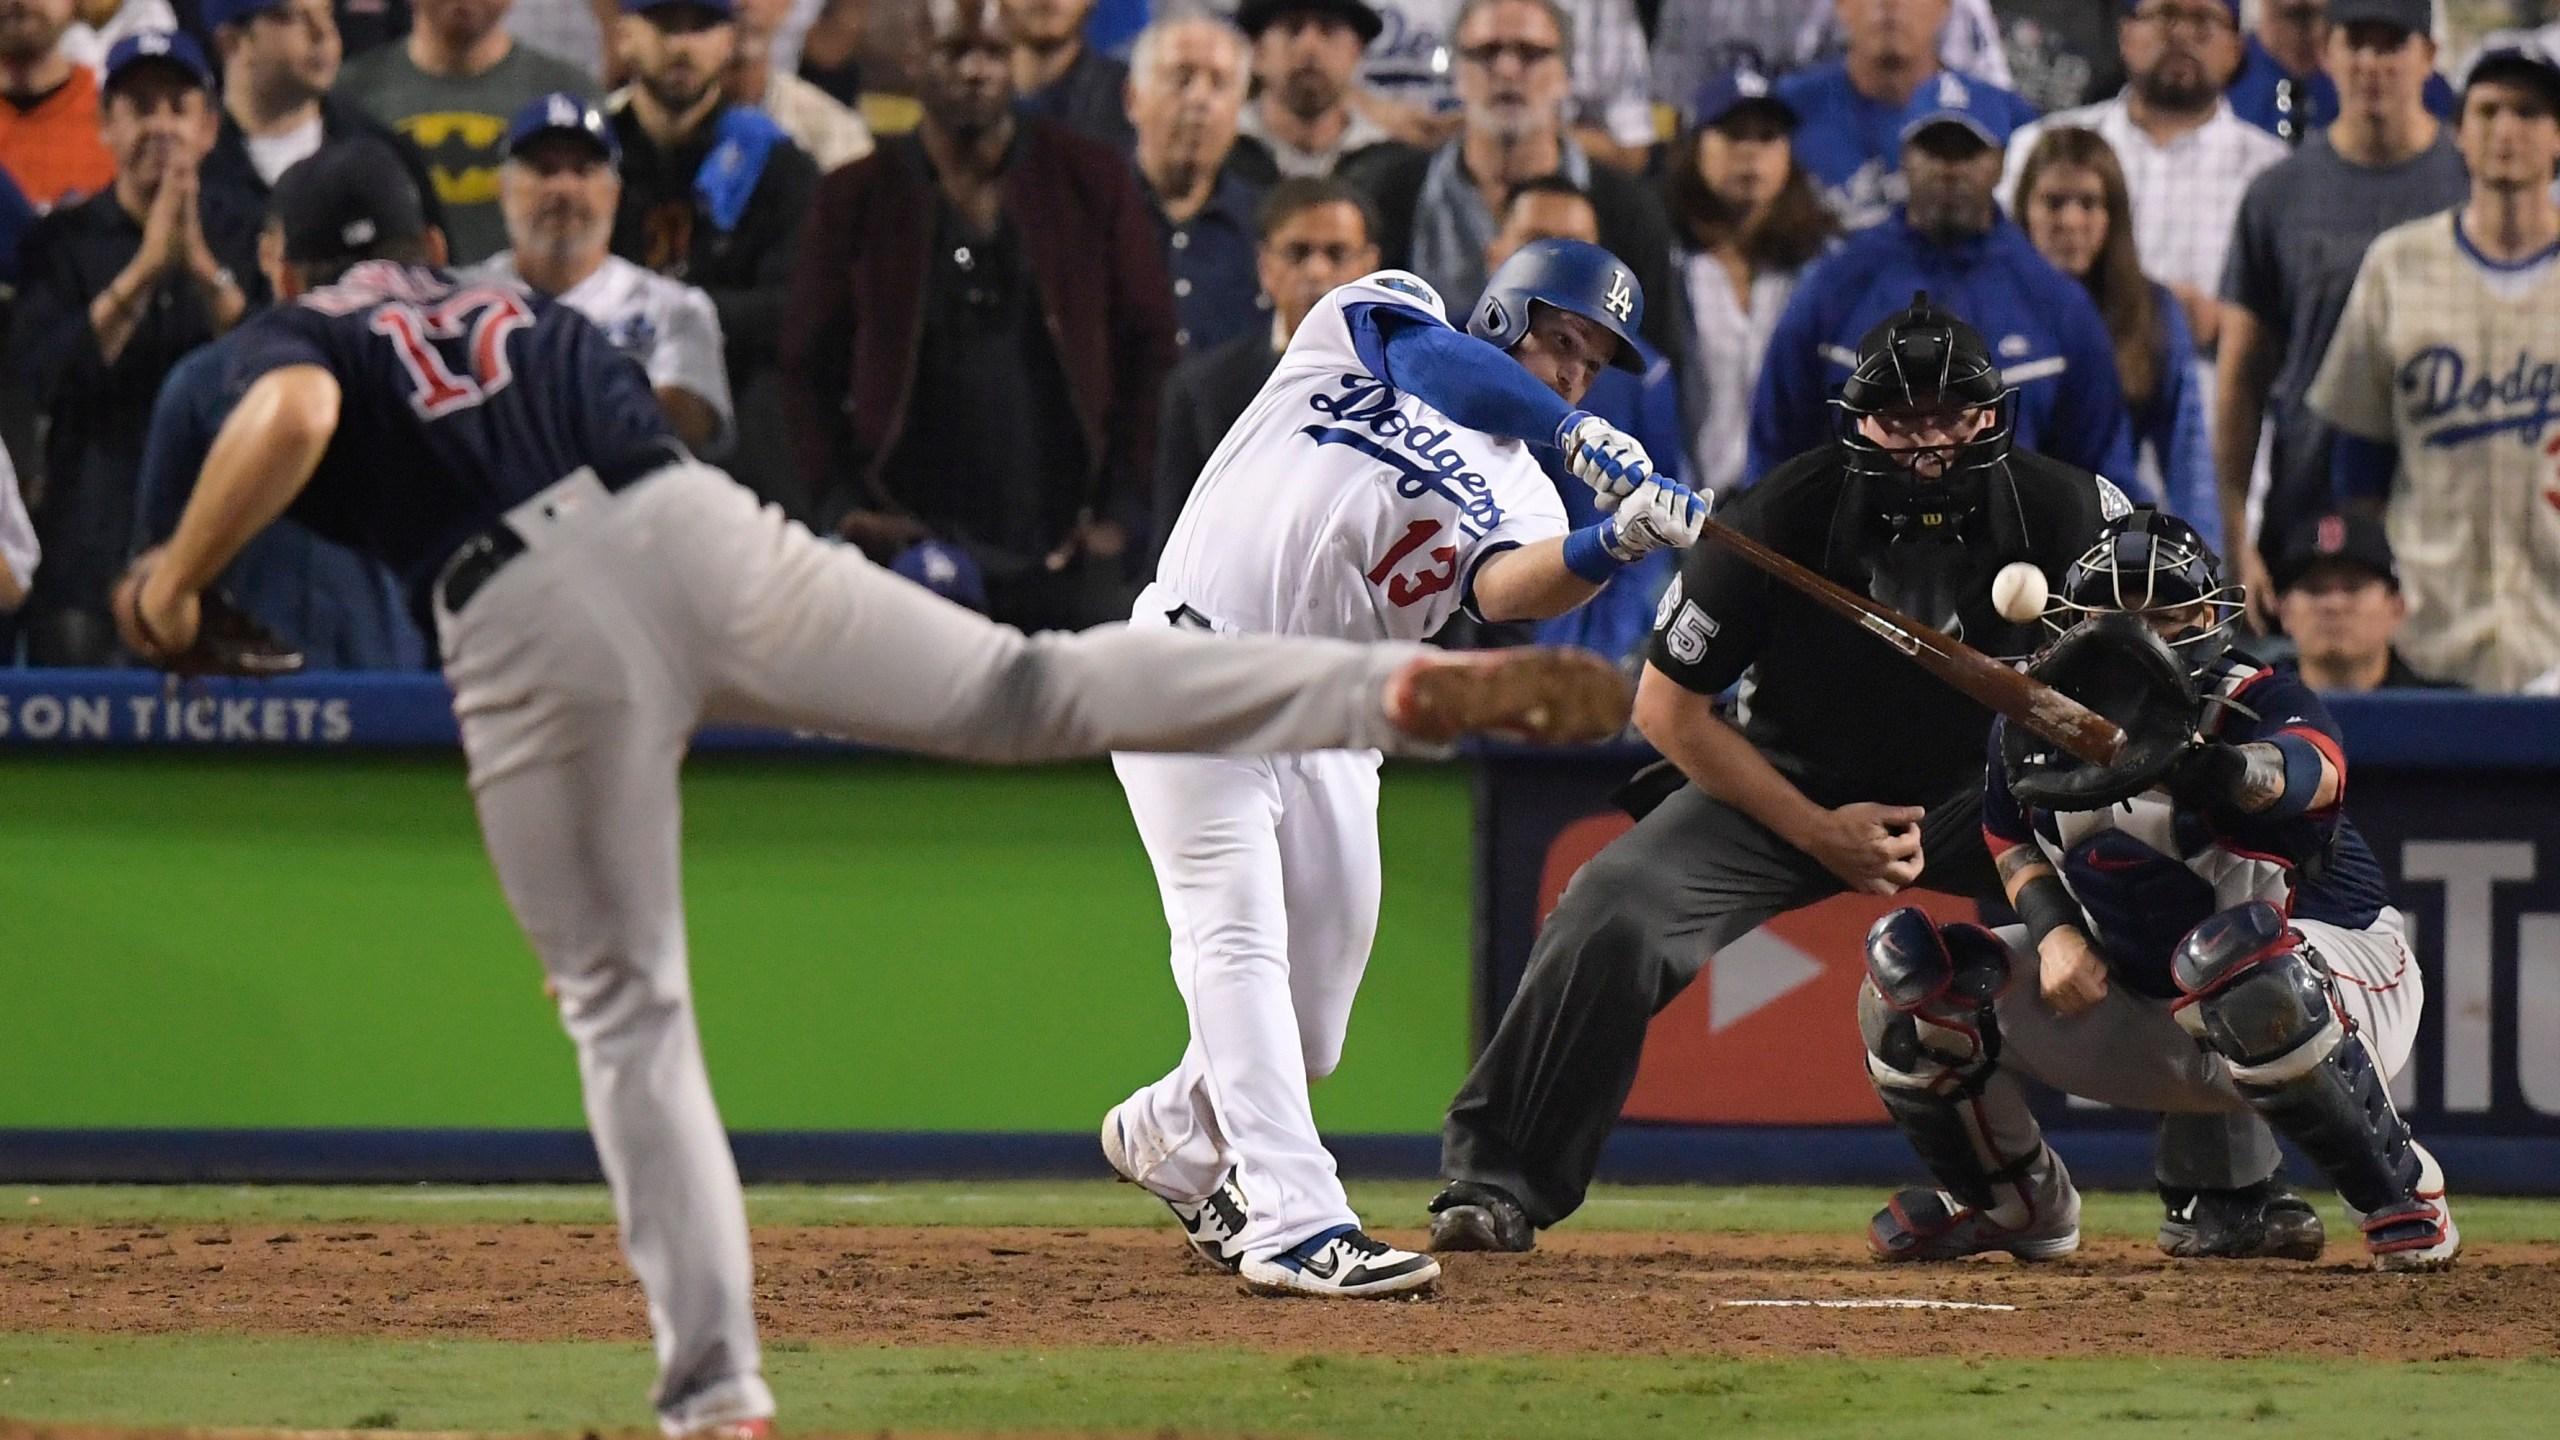 World_Series_Red_Sox_Dodgers_Baseball_01312-159532.jpg54093825